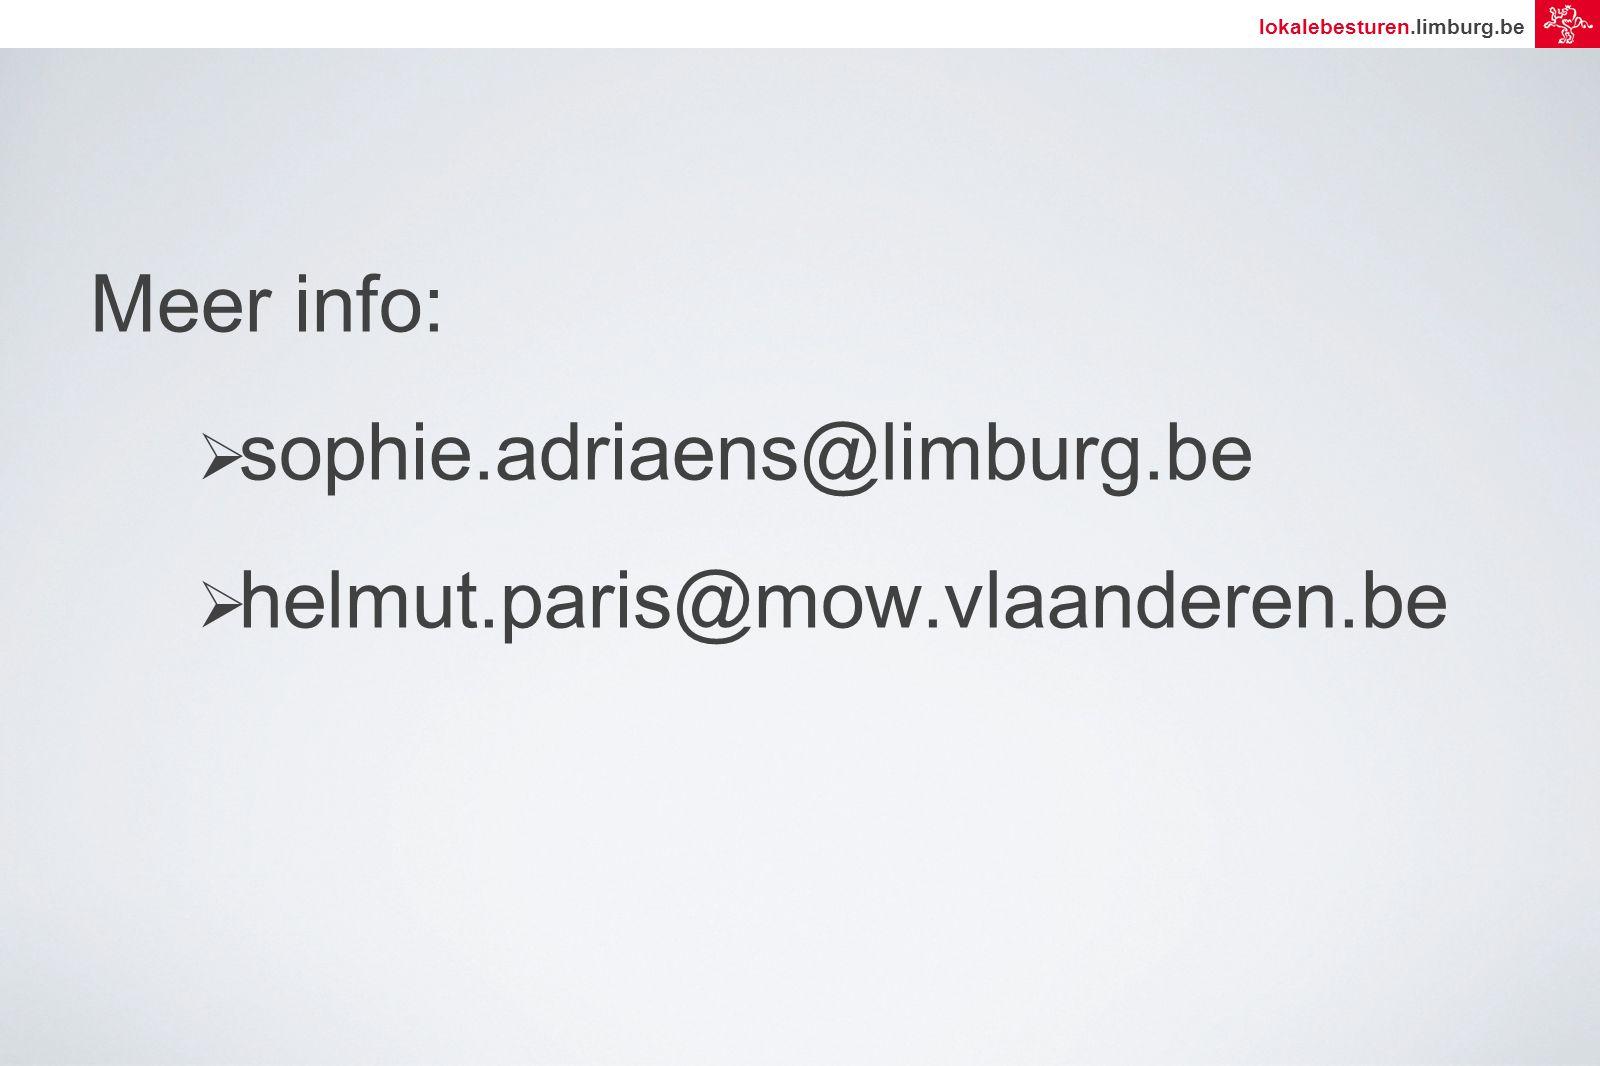 lokalebesturen.limburg.be Meer info:  sophie.adriaens@limburg.be  helmut.paris@mow.vlaanderen.be